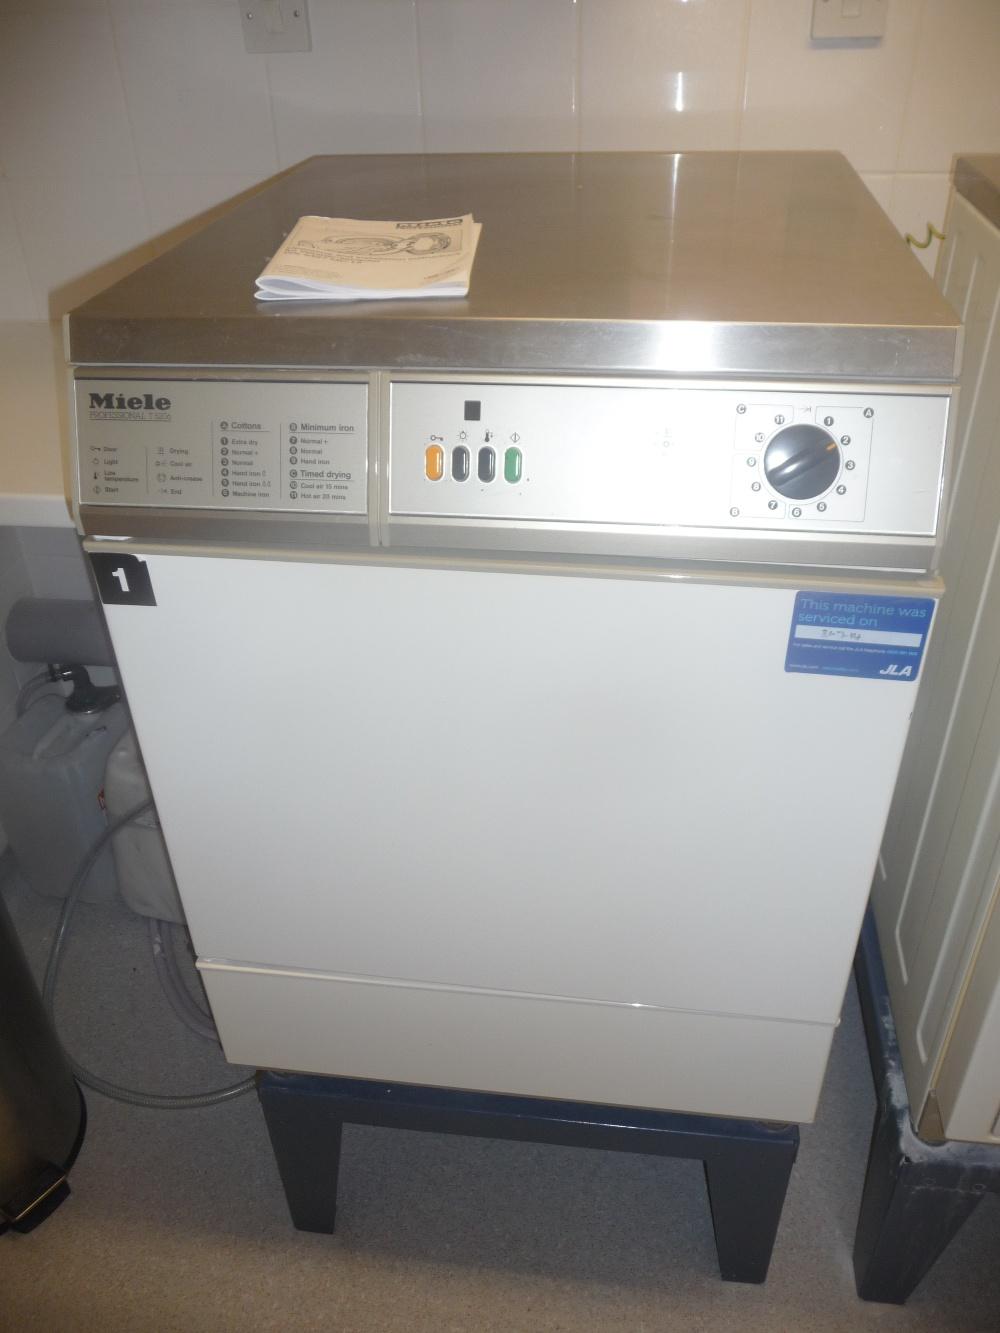 Miele professional t5206 tumble dryer - Miele professional ...